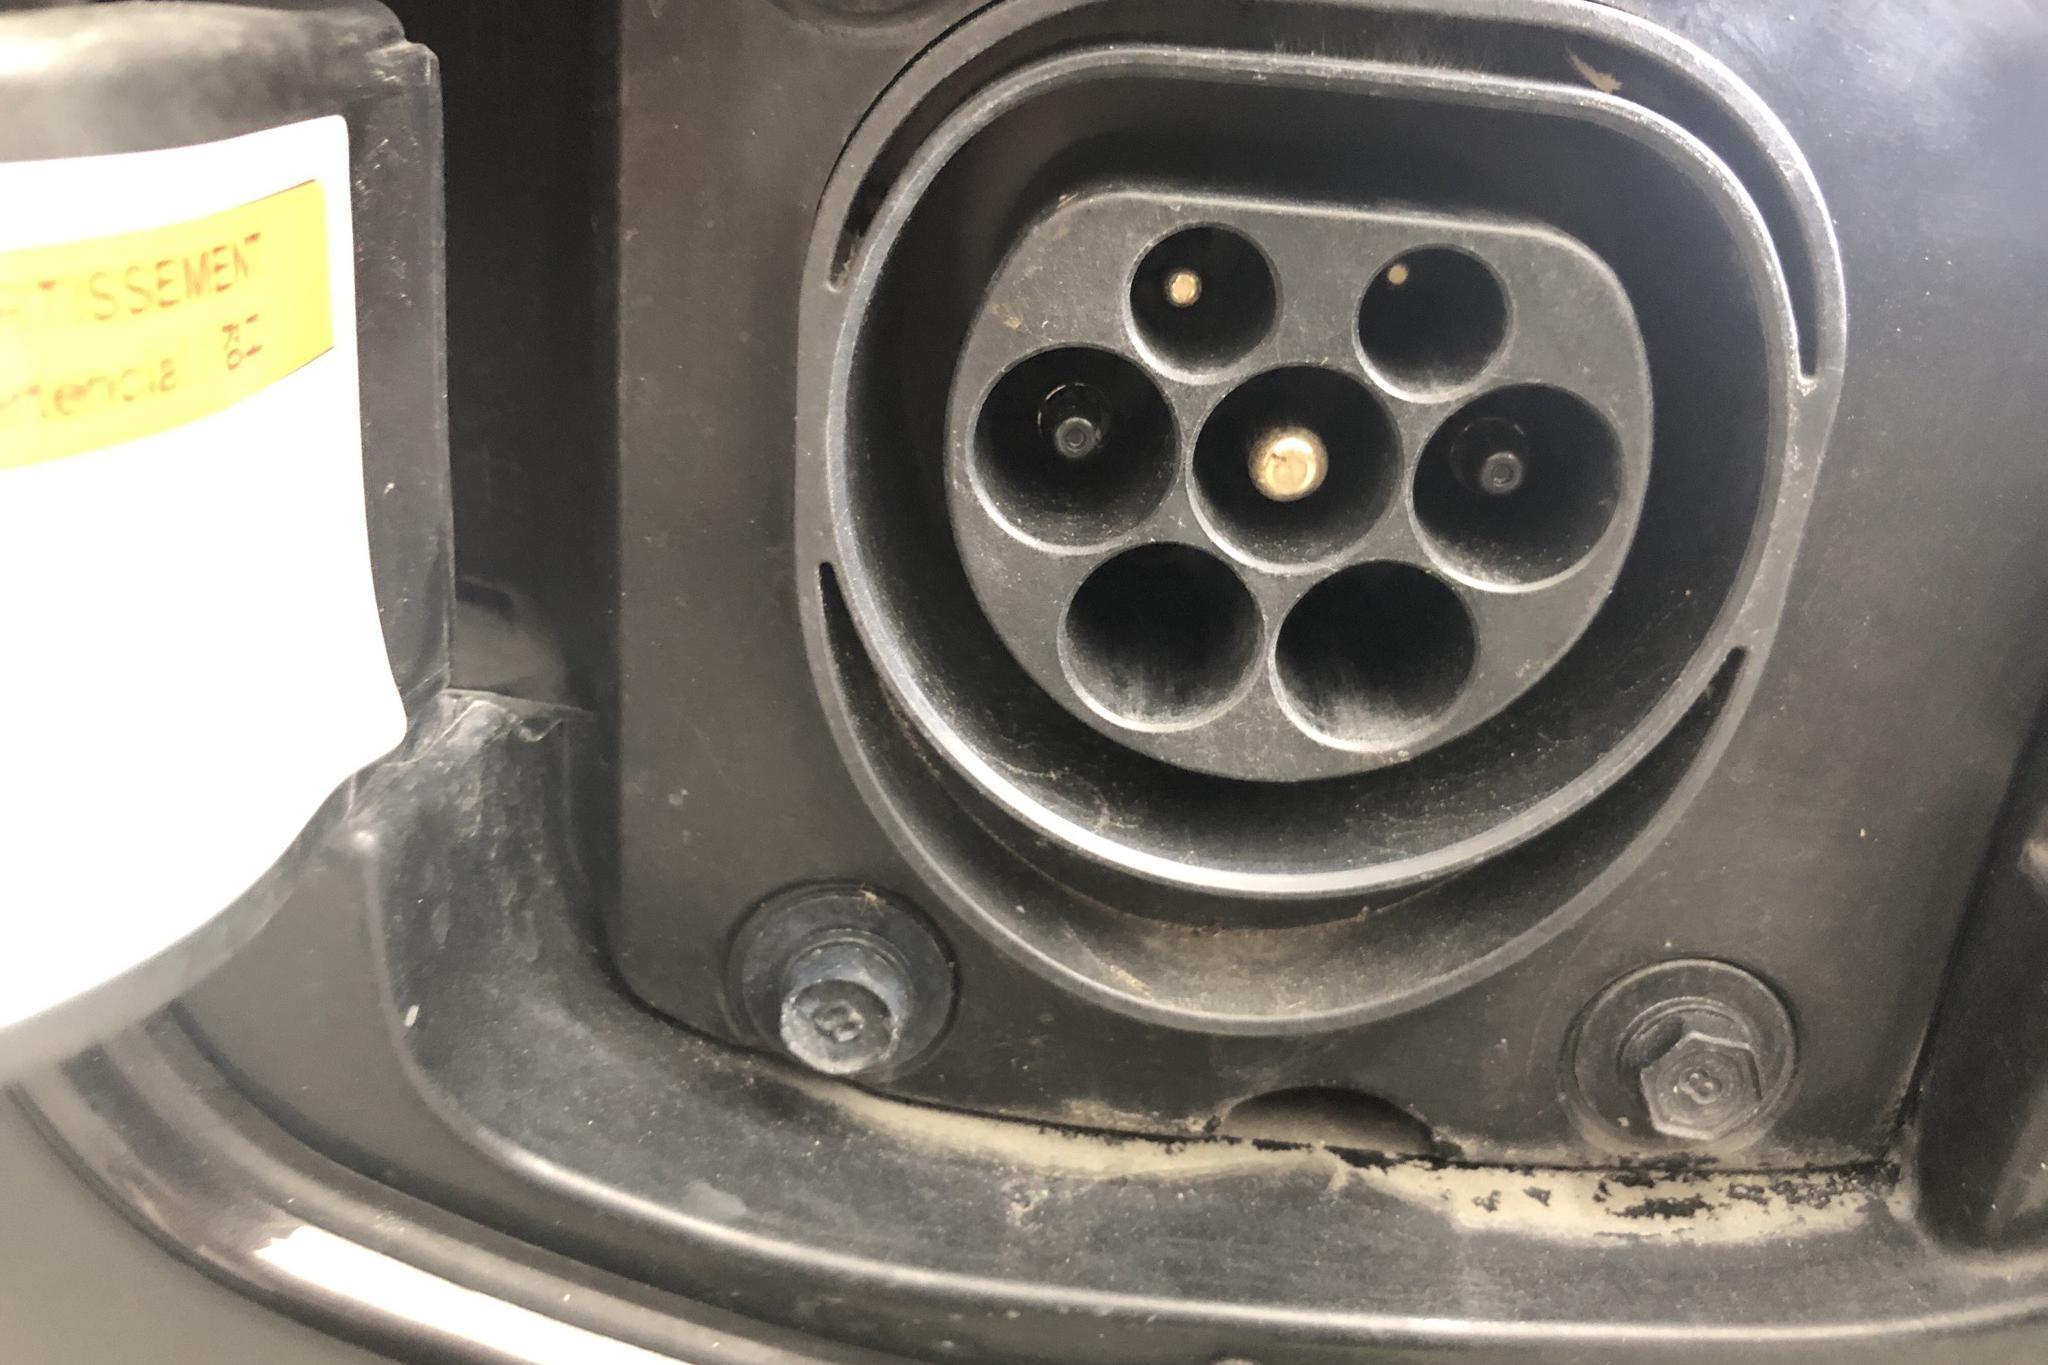 KIA Niro Plug-in Hybrid 1.6 (141hk) - 3 373 mil - Automat - brun - 2019